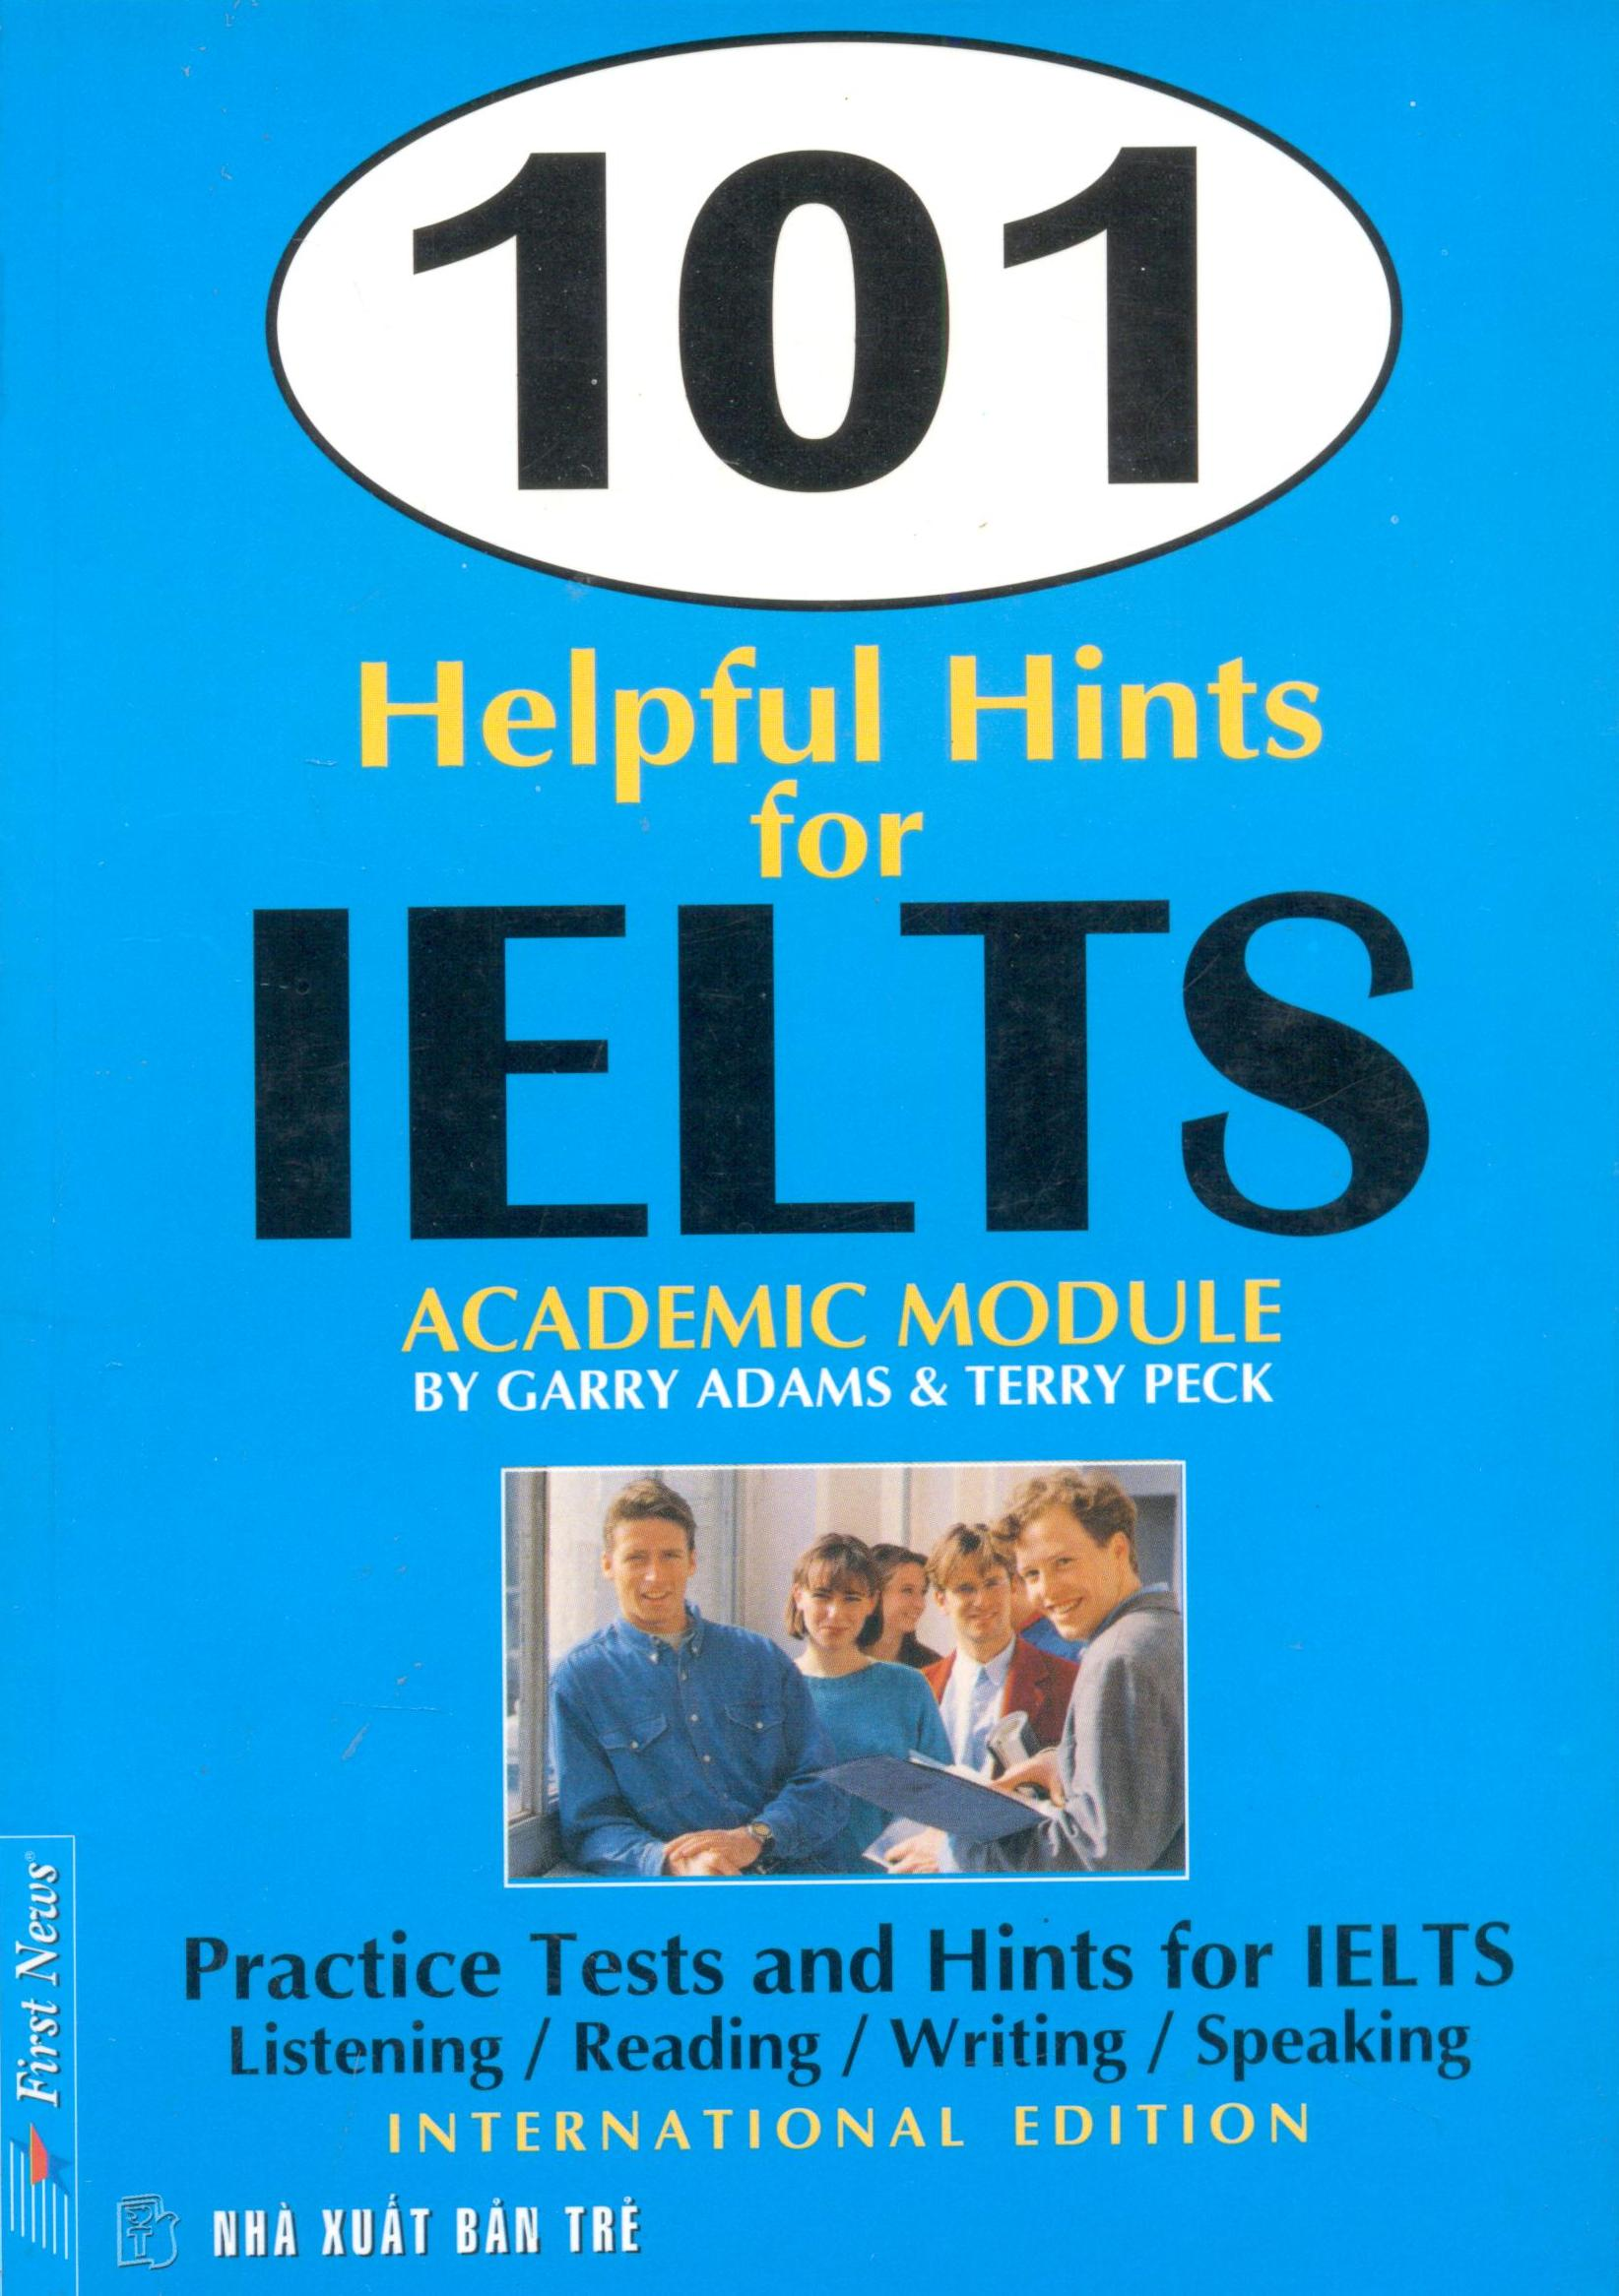 101 helpful hints for IELTS